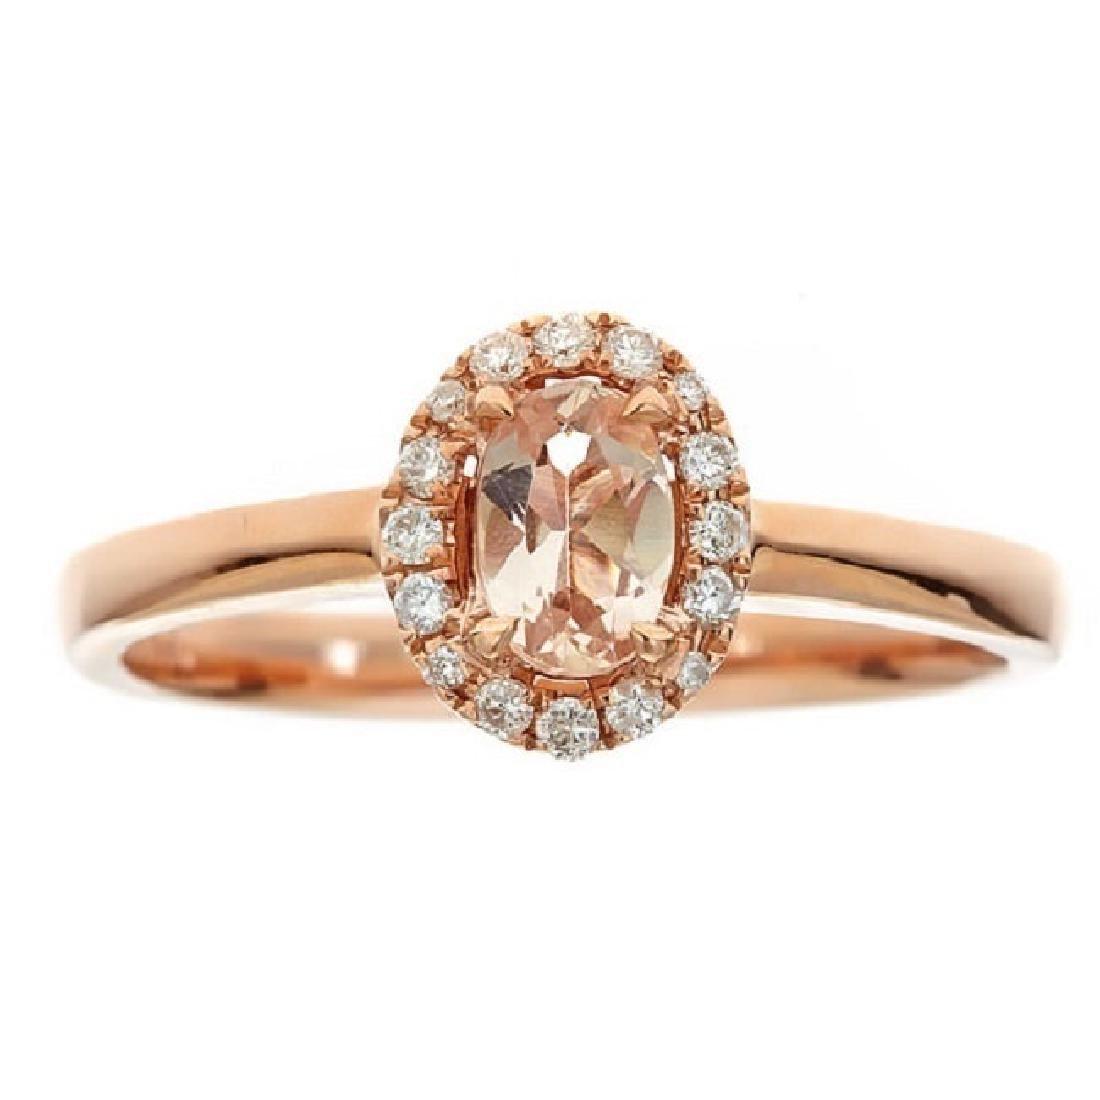 0.43 ctw Morganite and Diamond Ring - 10KT Rose Gold